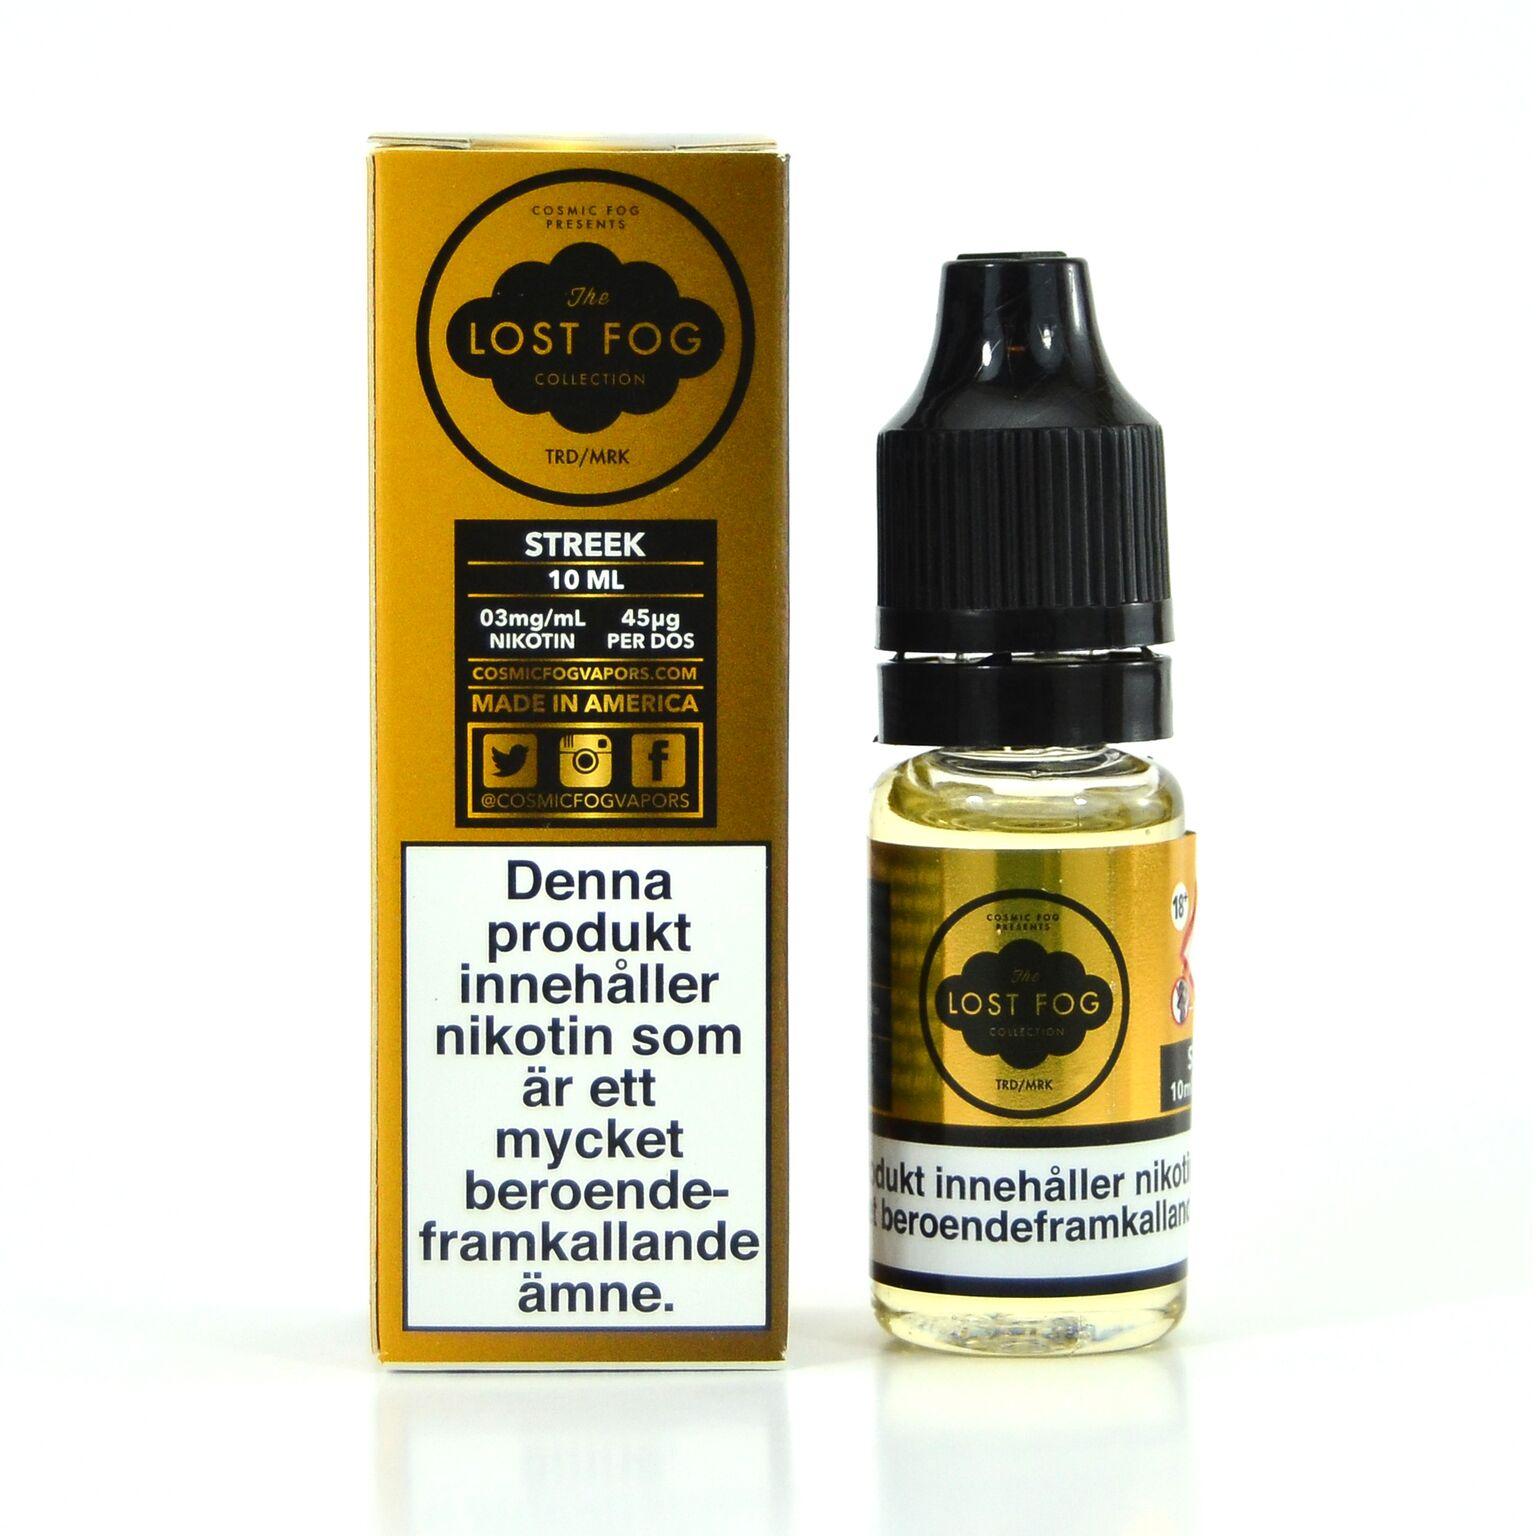 Lost Fog Streek e-juice with nicotine